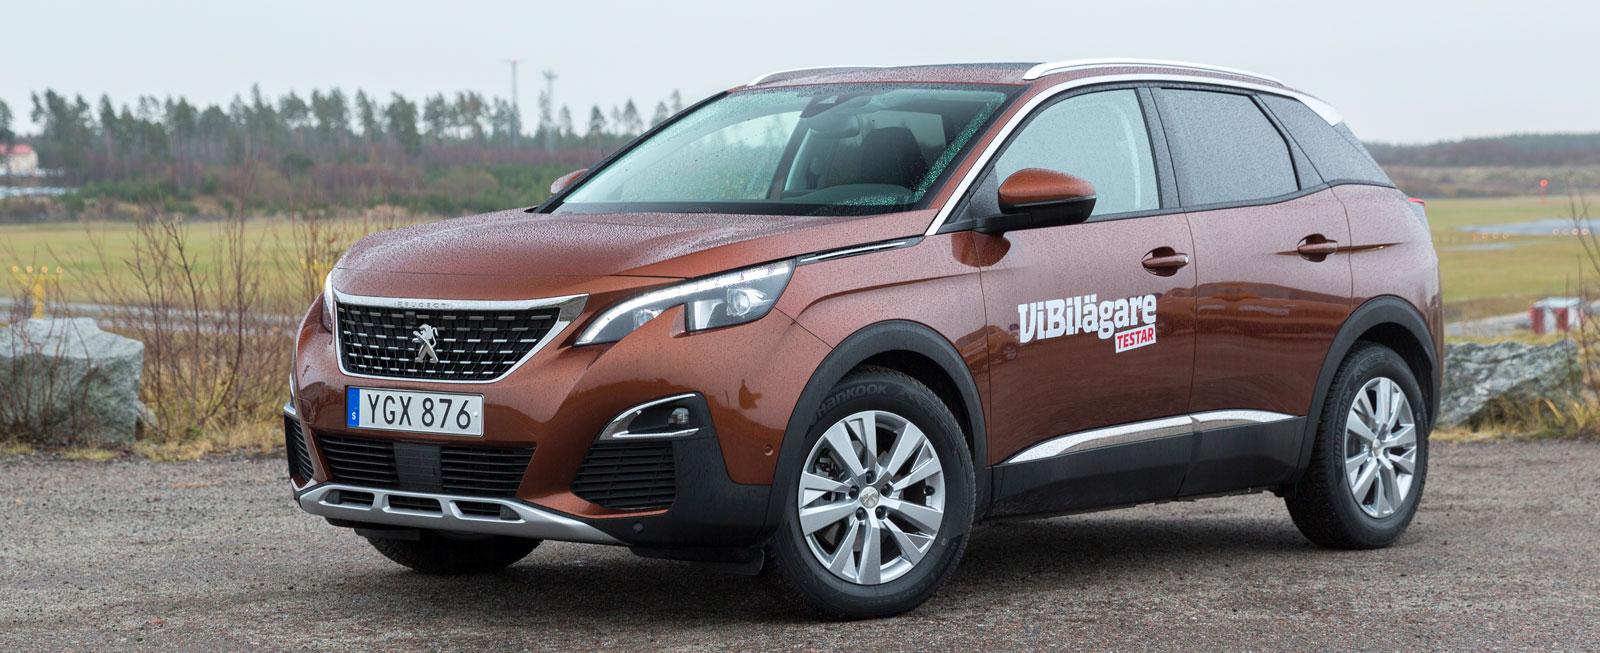 Peugeot 3008  1,6 HDI Allure